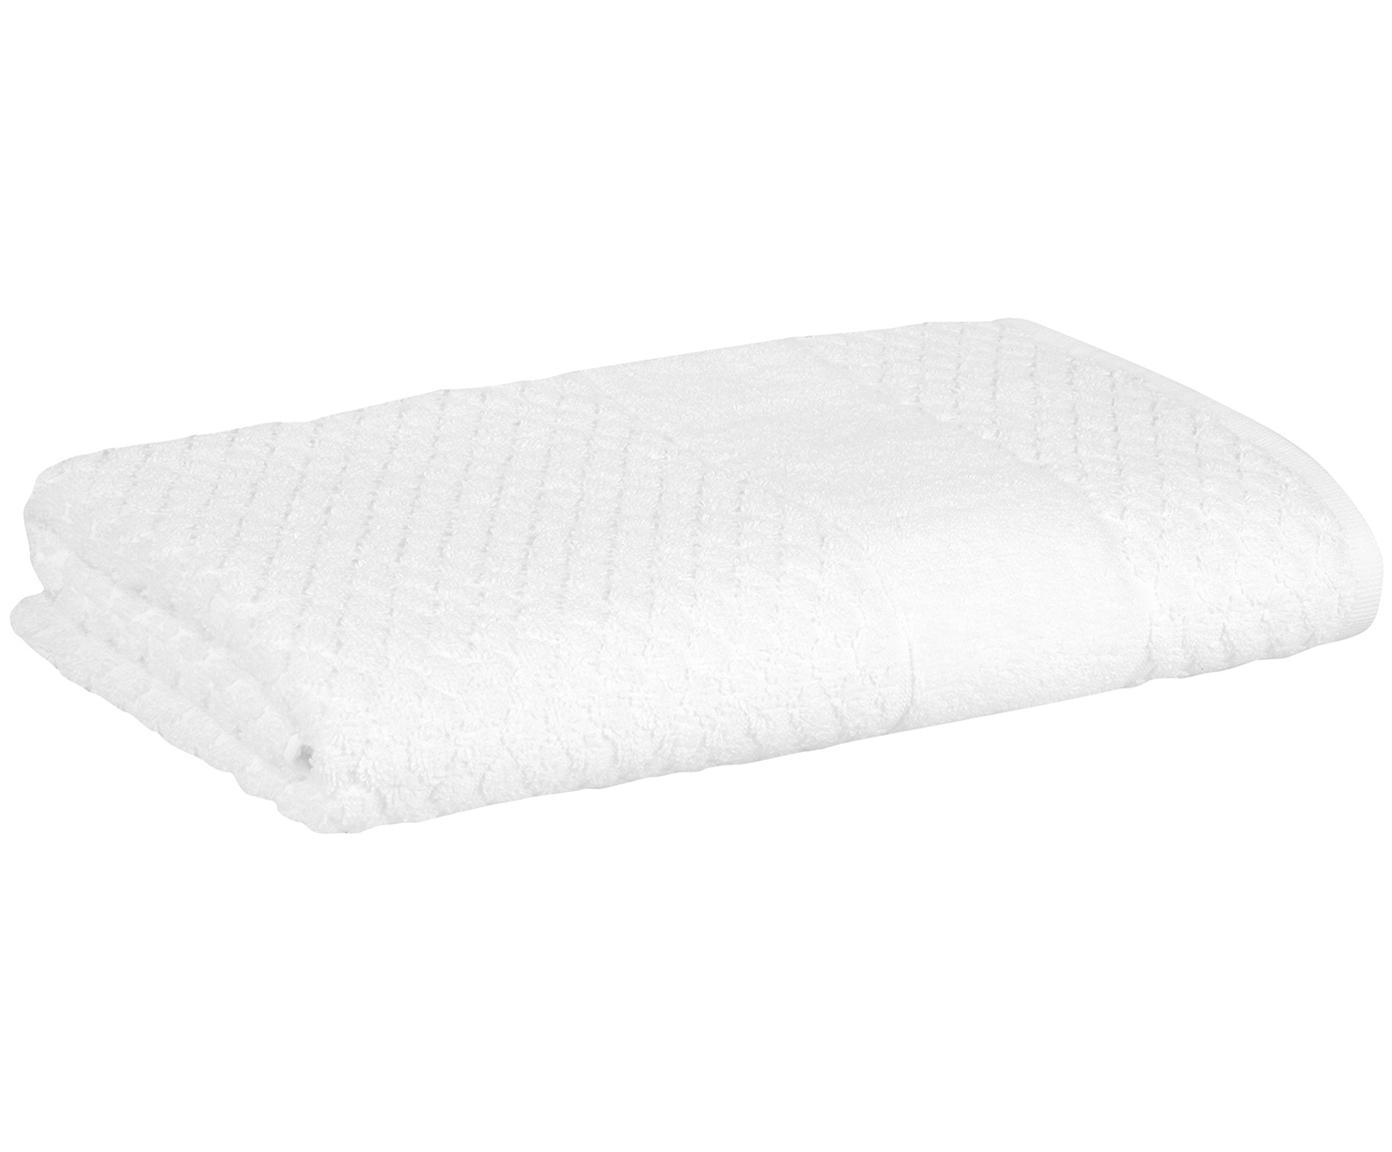 Handdoek Katharina, 100% katoen, Middelzware kwaliteit 500 g/m², Wit, Handdoek